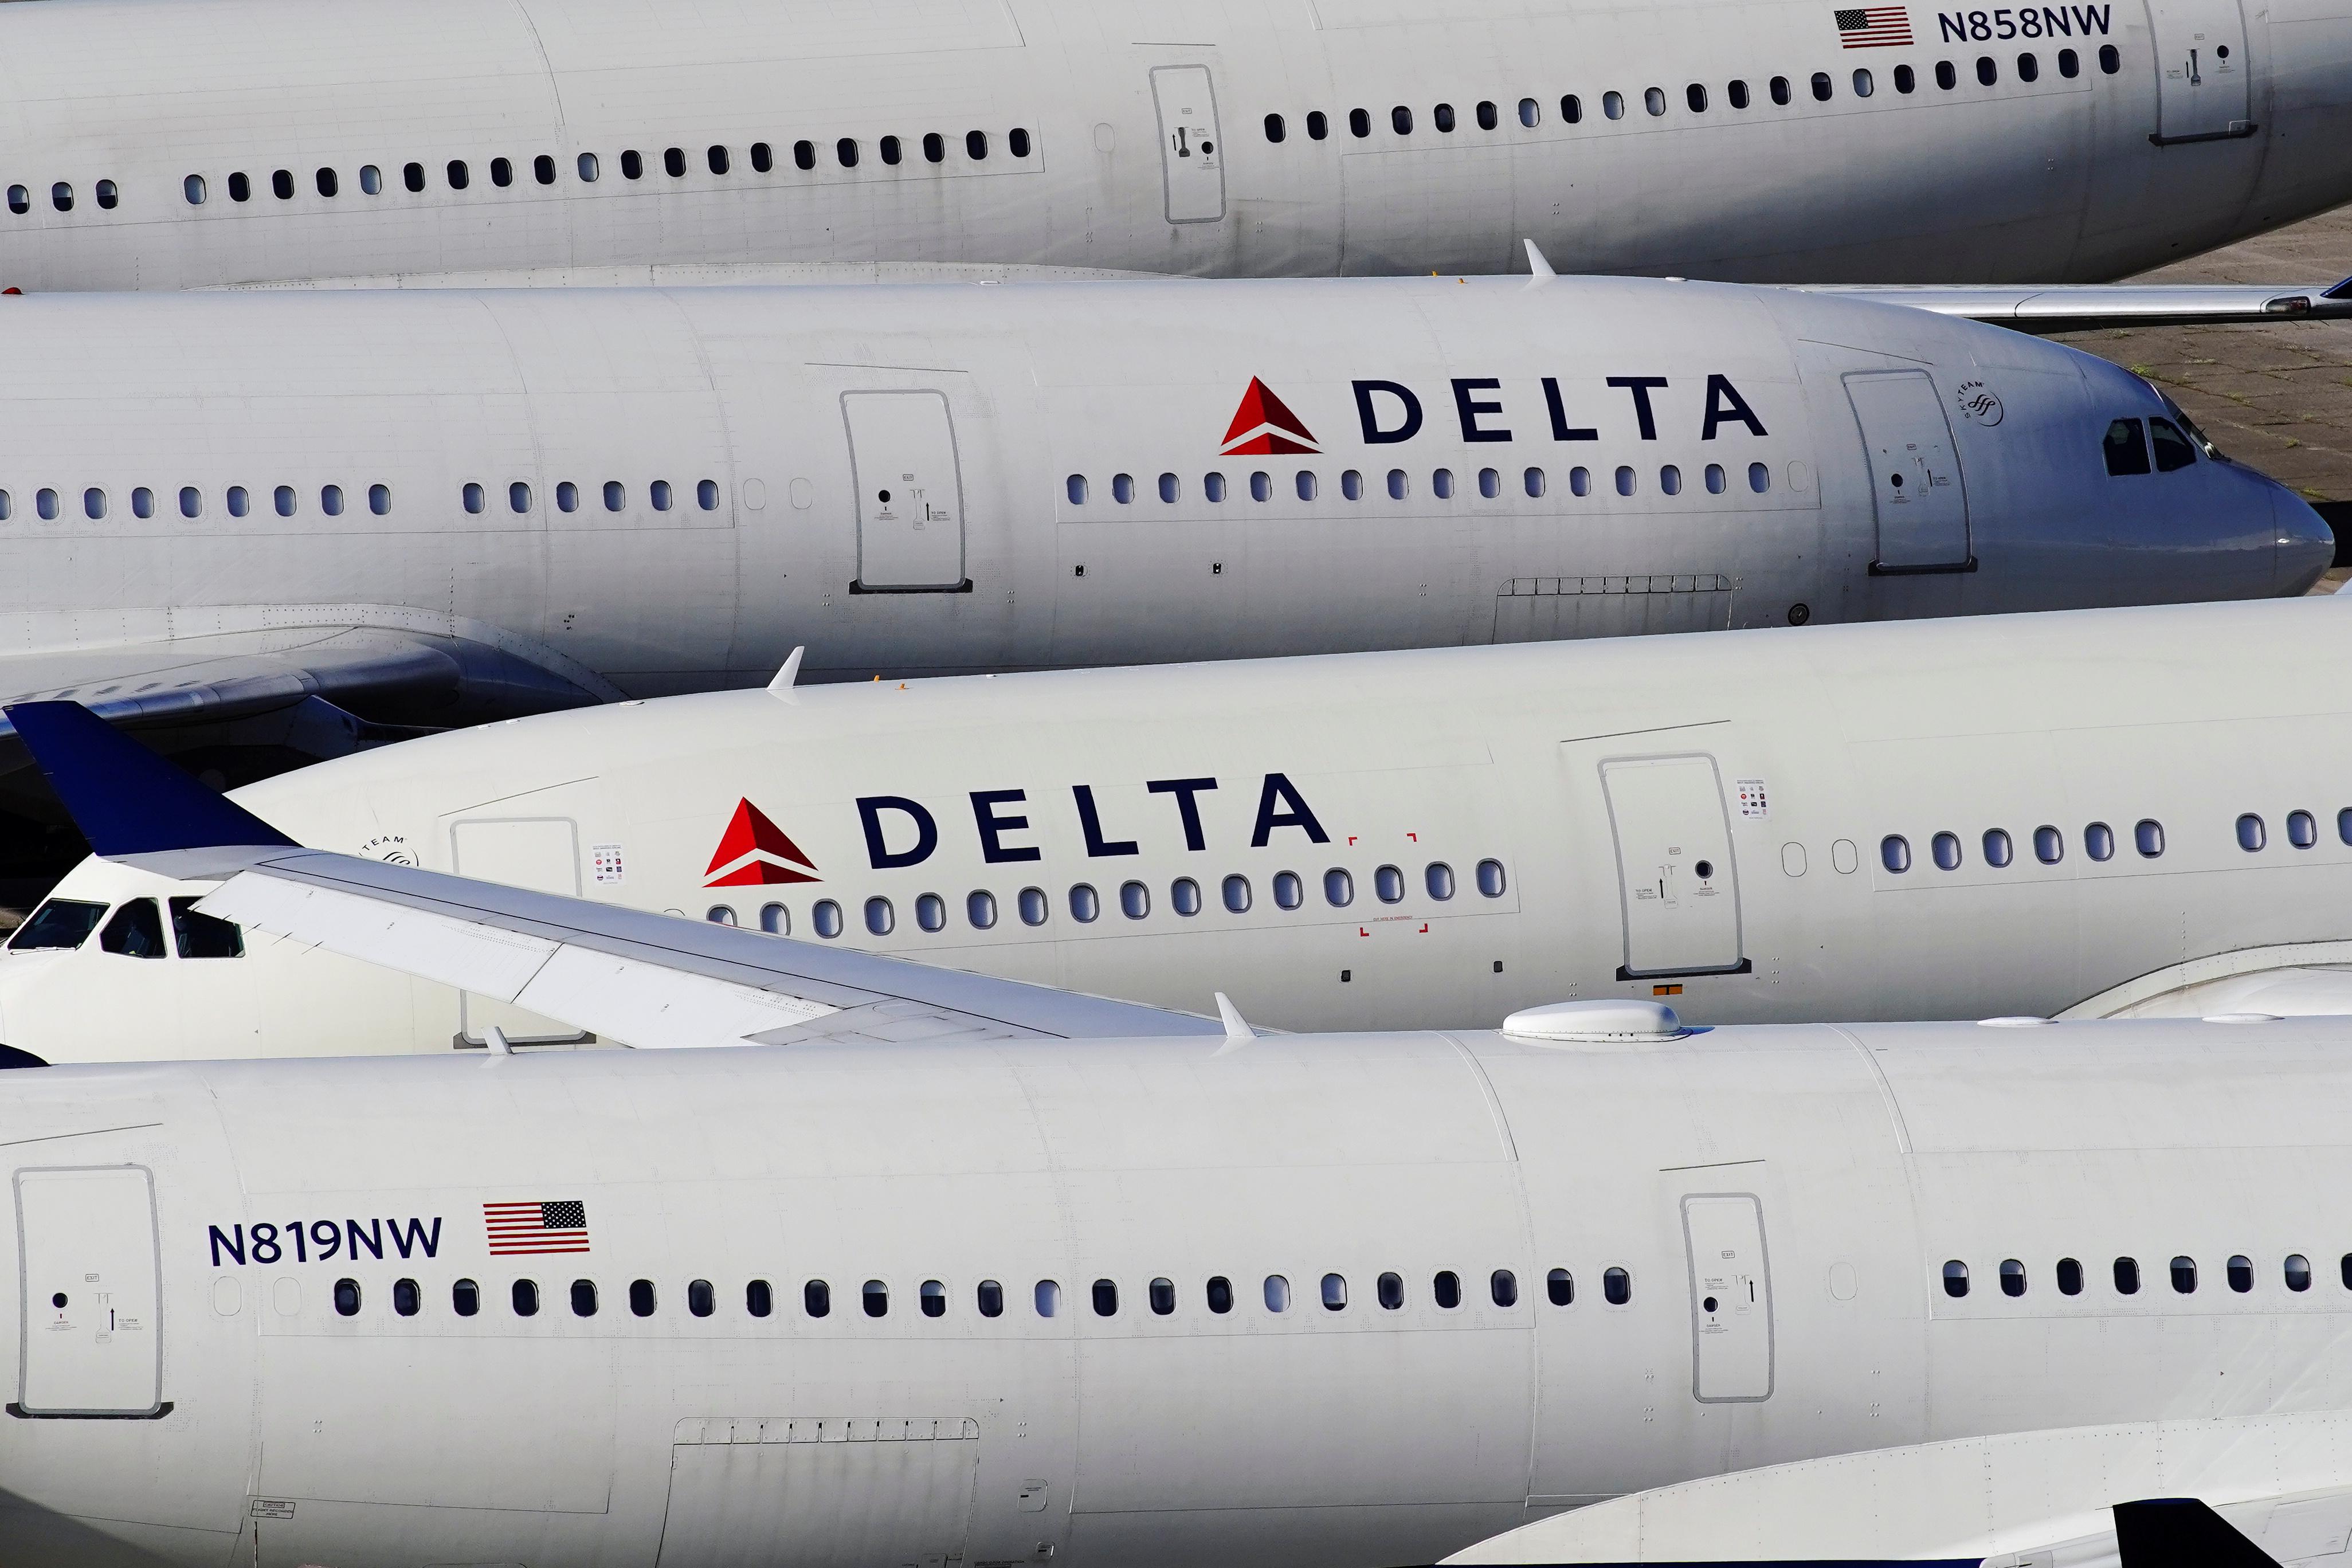 Delta Air Lines passenger planes are seen parked at Birmingham-Shuttlesworth International Airport in Birmingham, Alabama, U.S. March 25, 2020.  REUTERS/Elijah Nouvelage